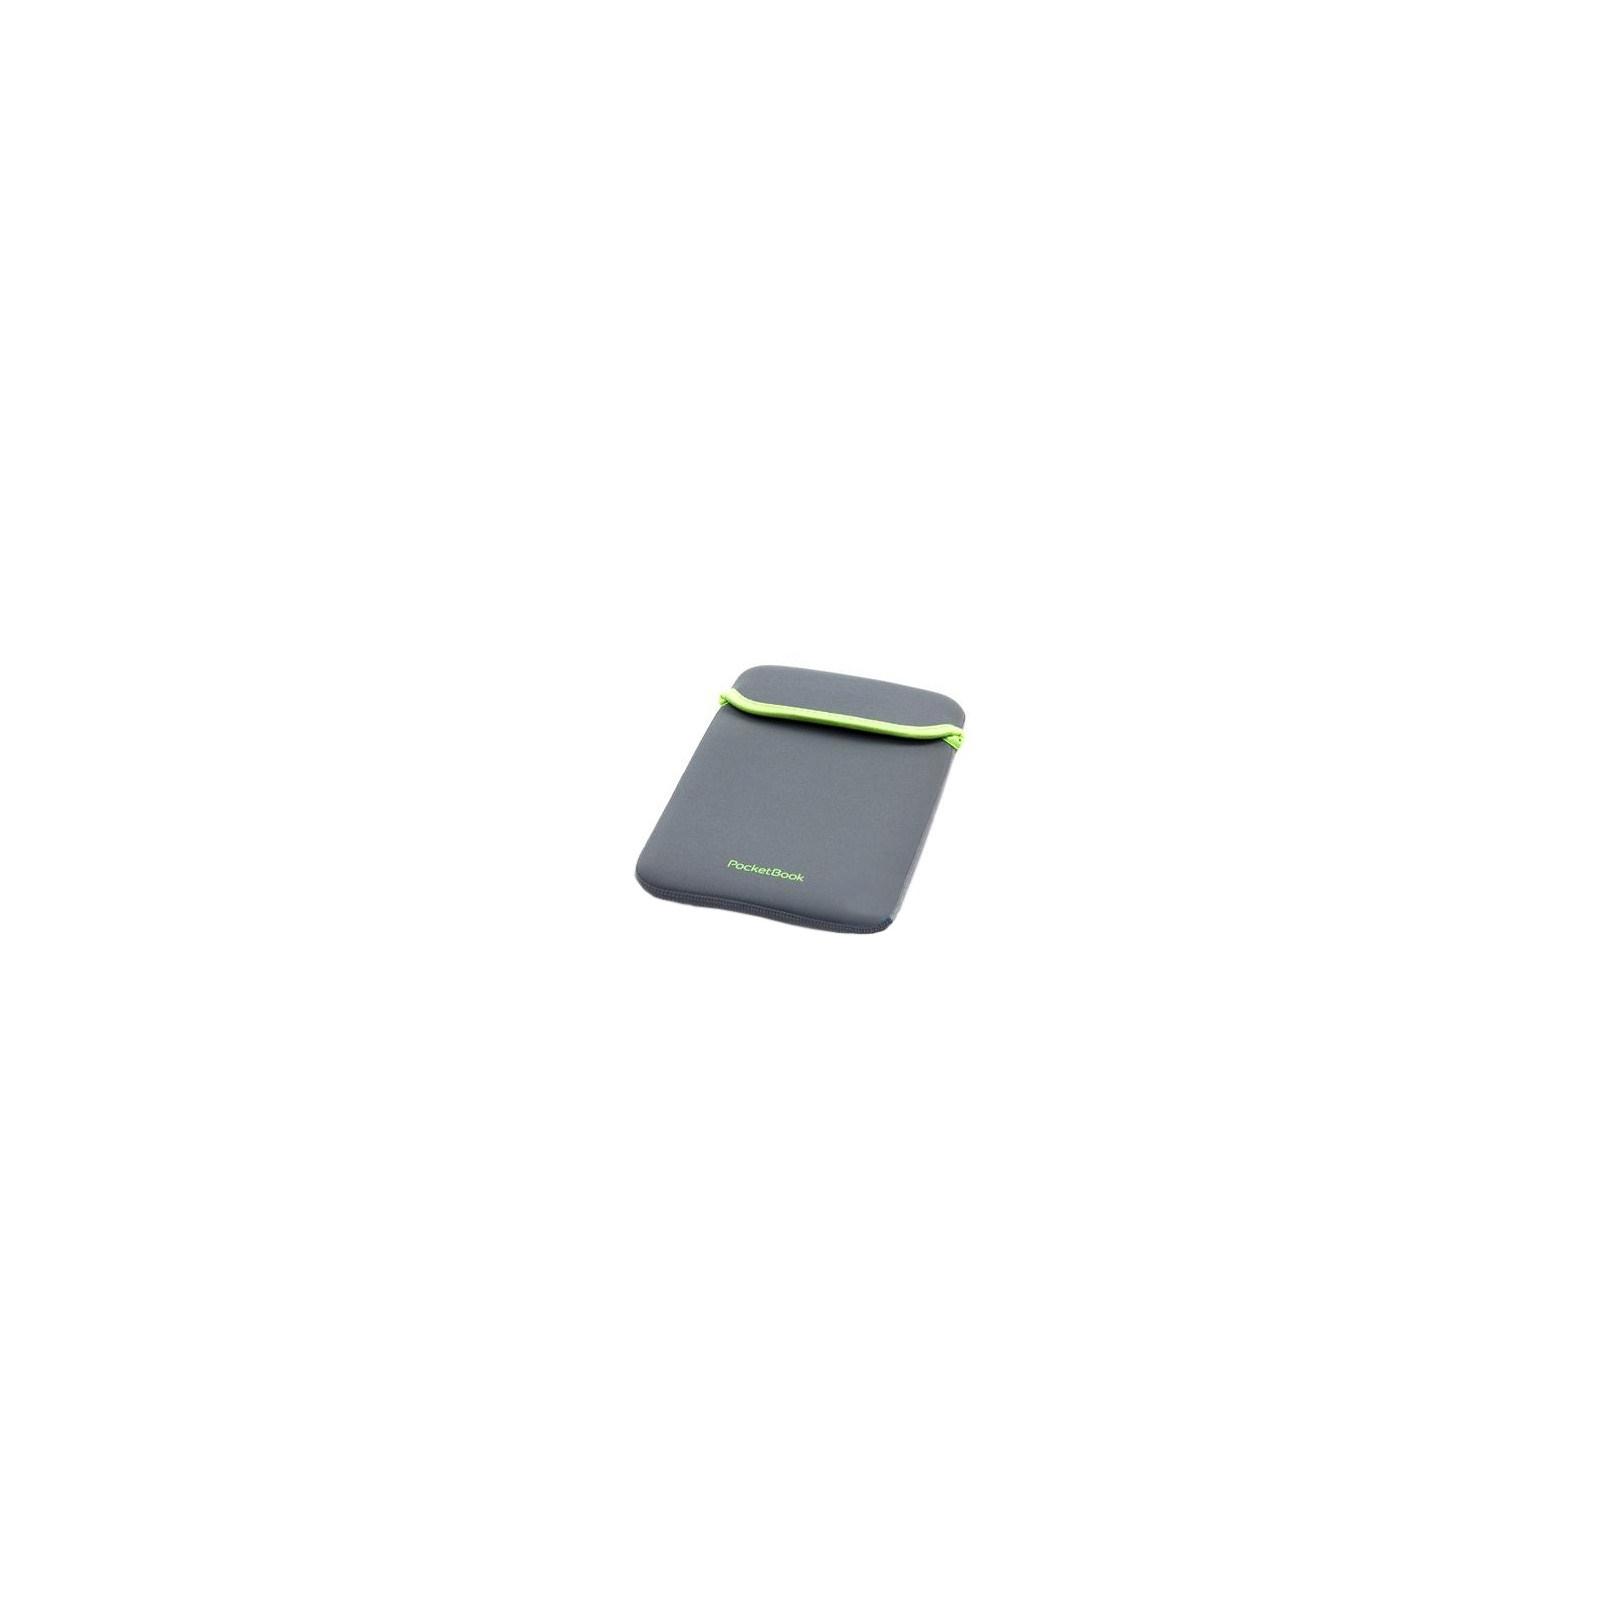 Чехол для планшета PocketBook A7 (VWNEC-A7-GB)